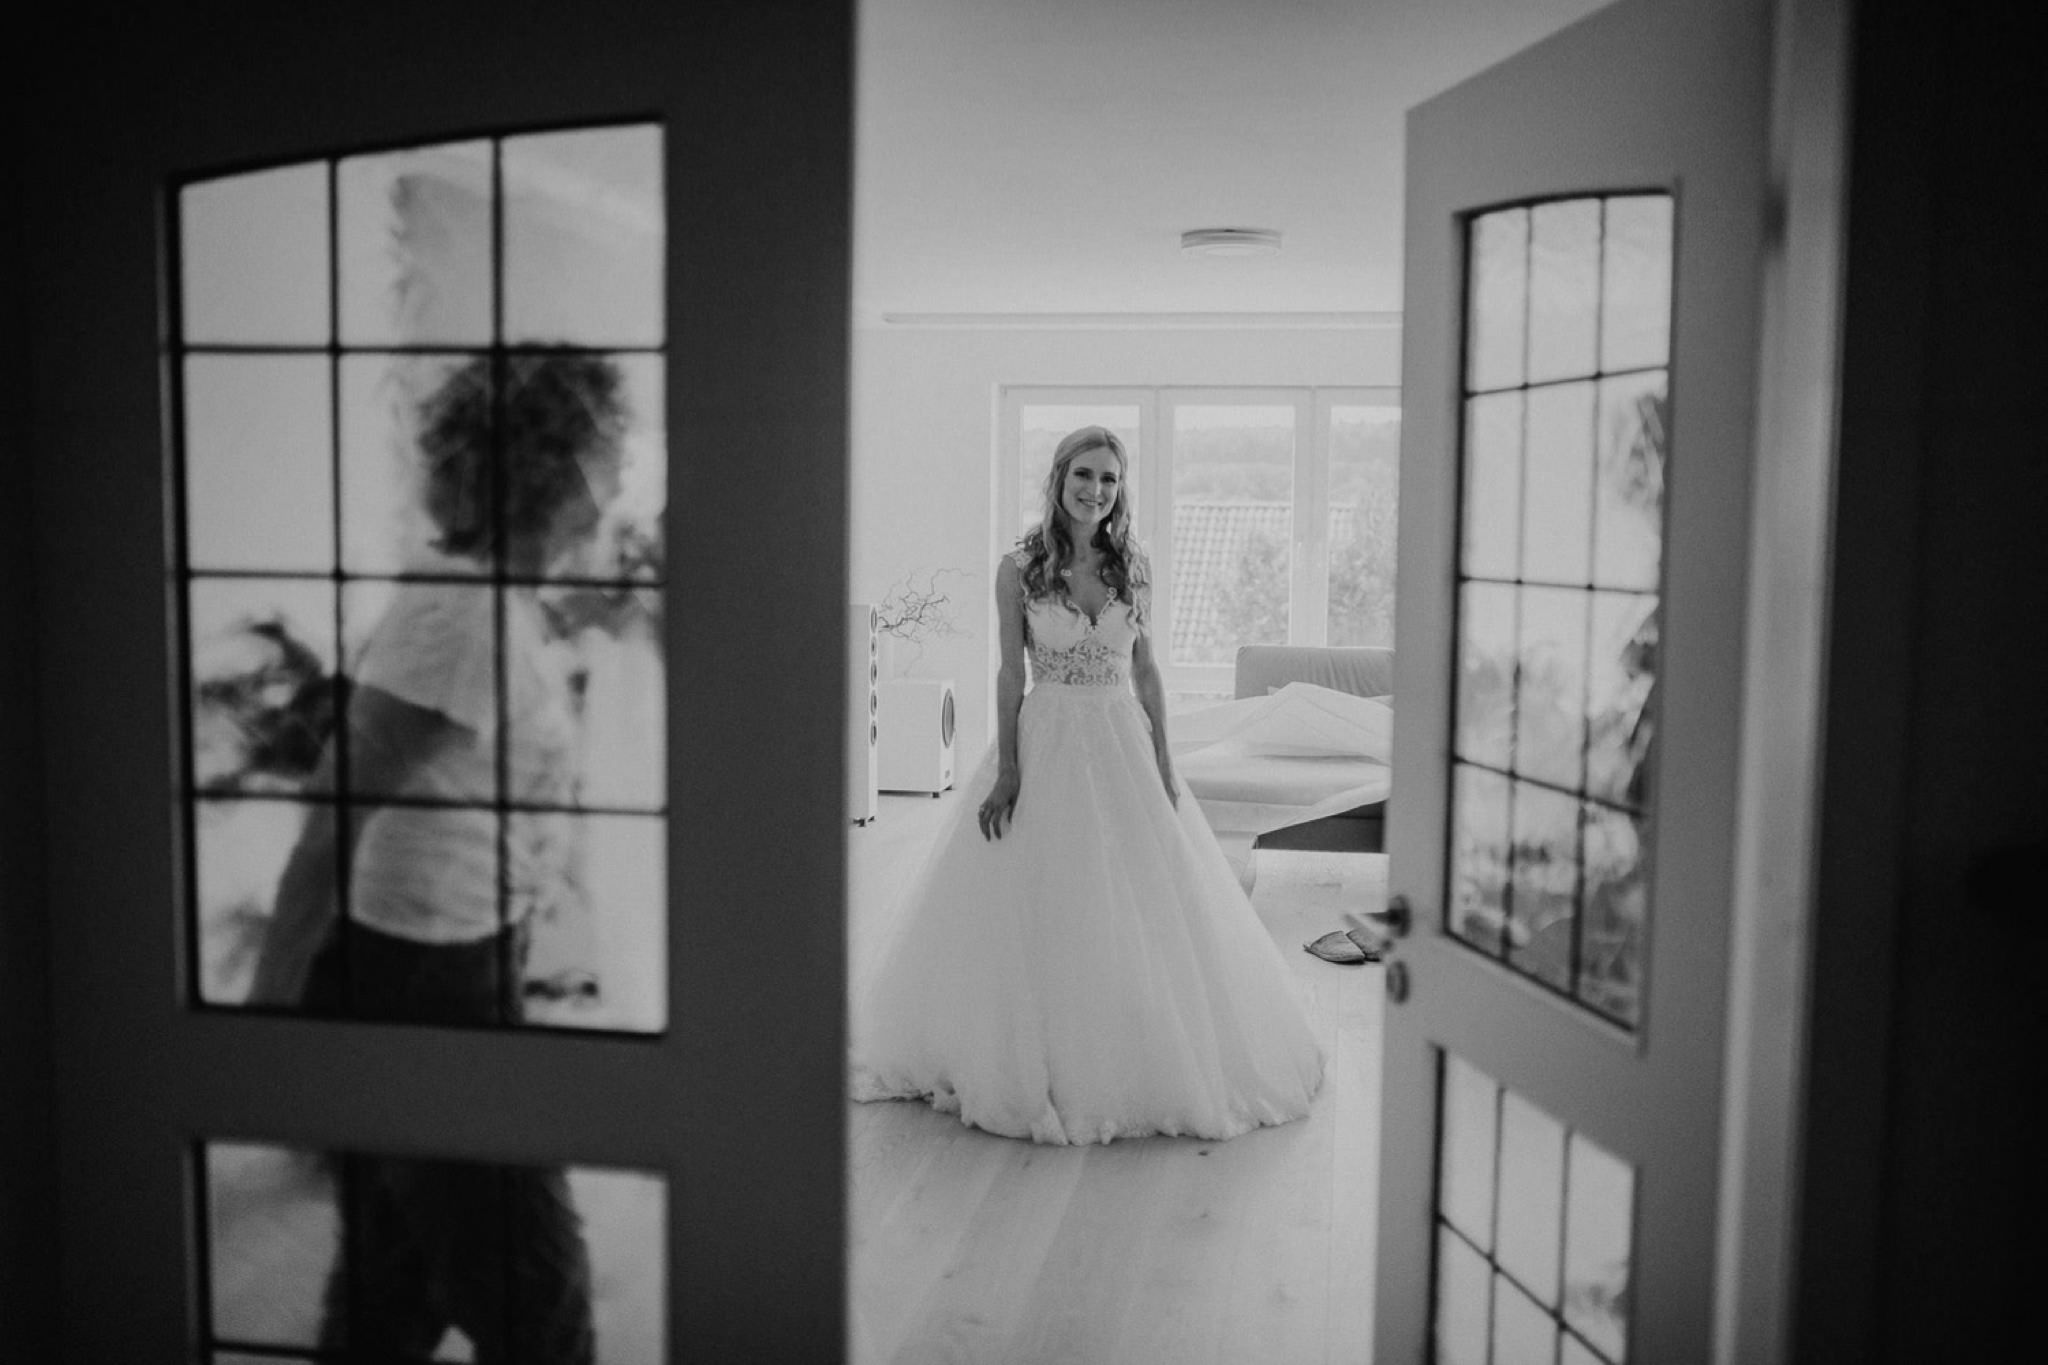 wedding photographer hamilton new zealand 1002 2